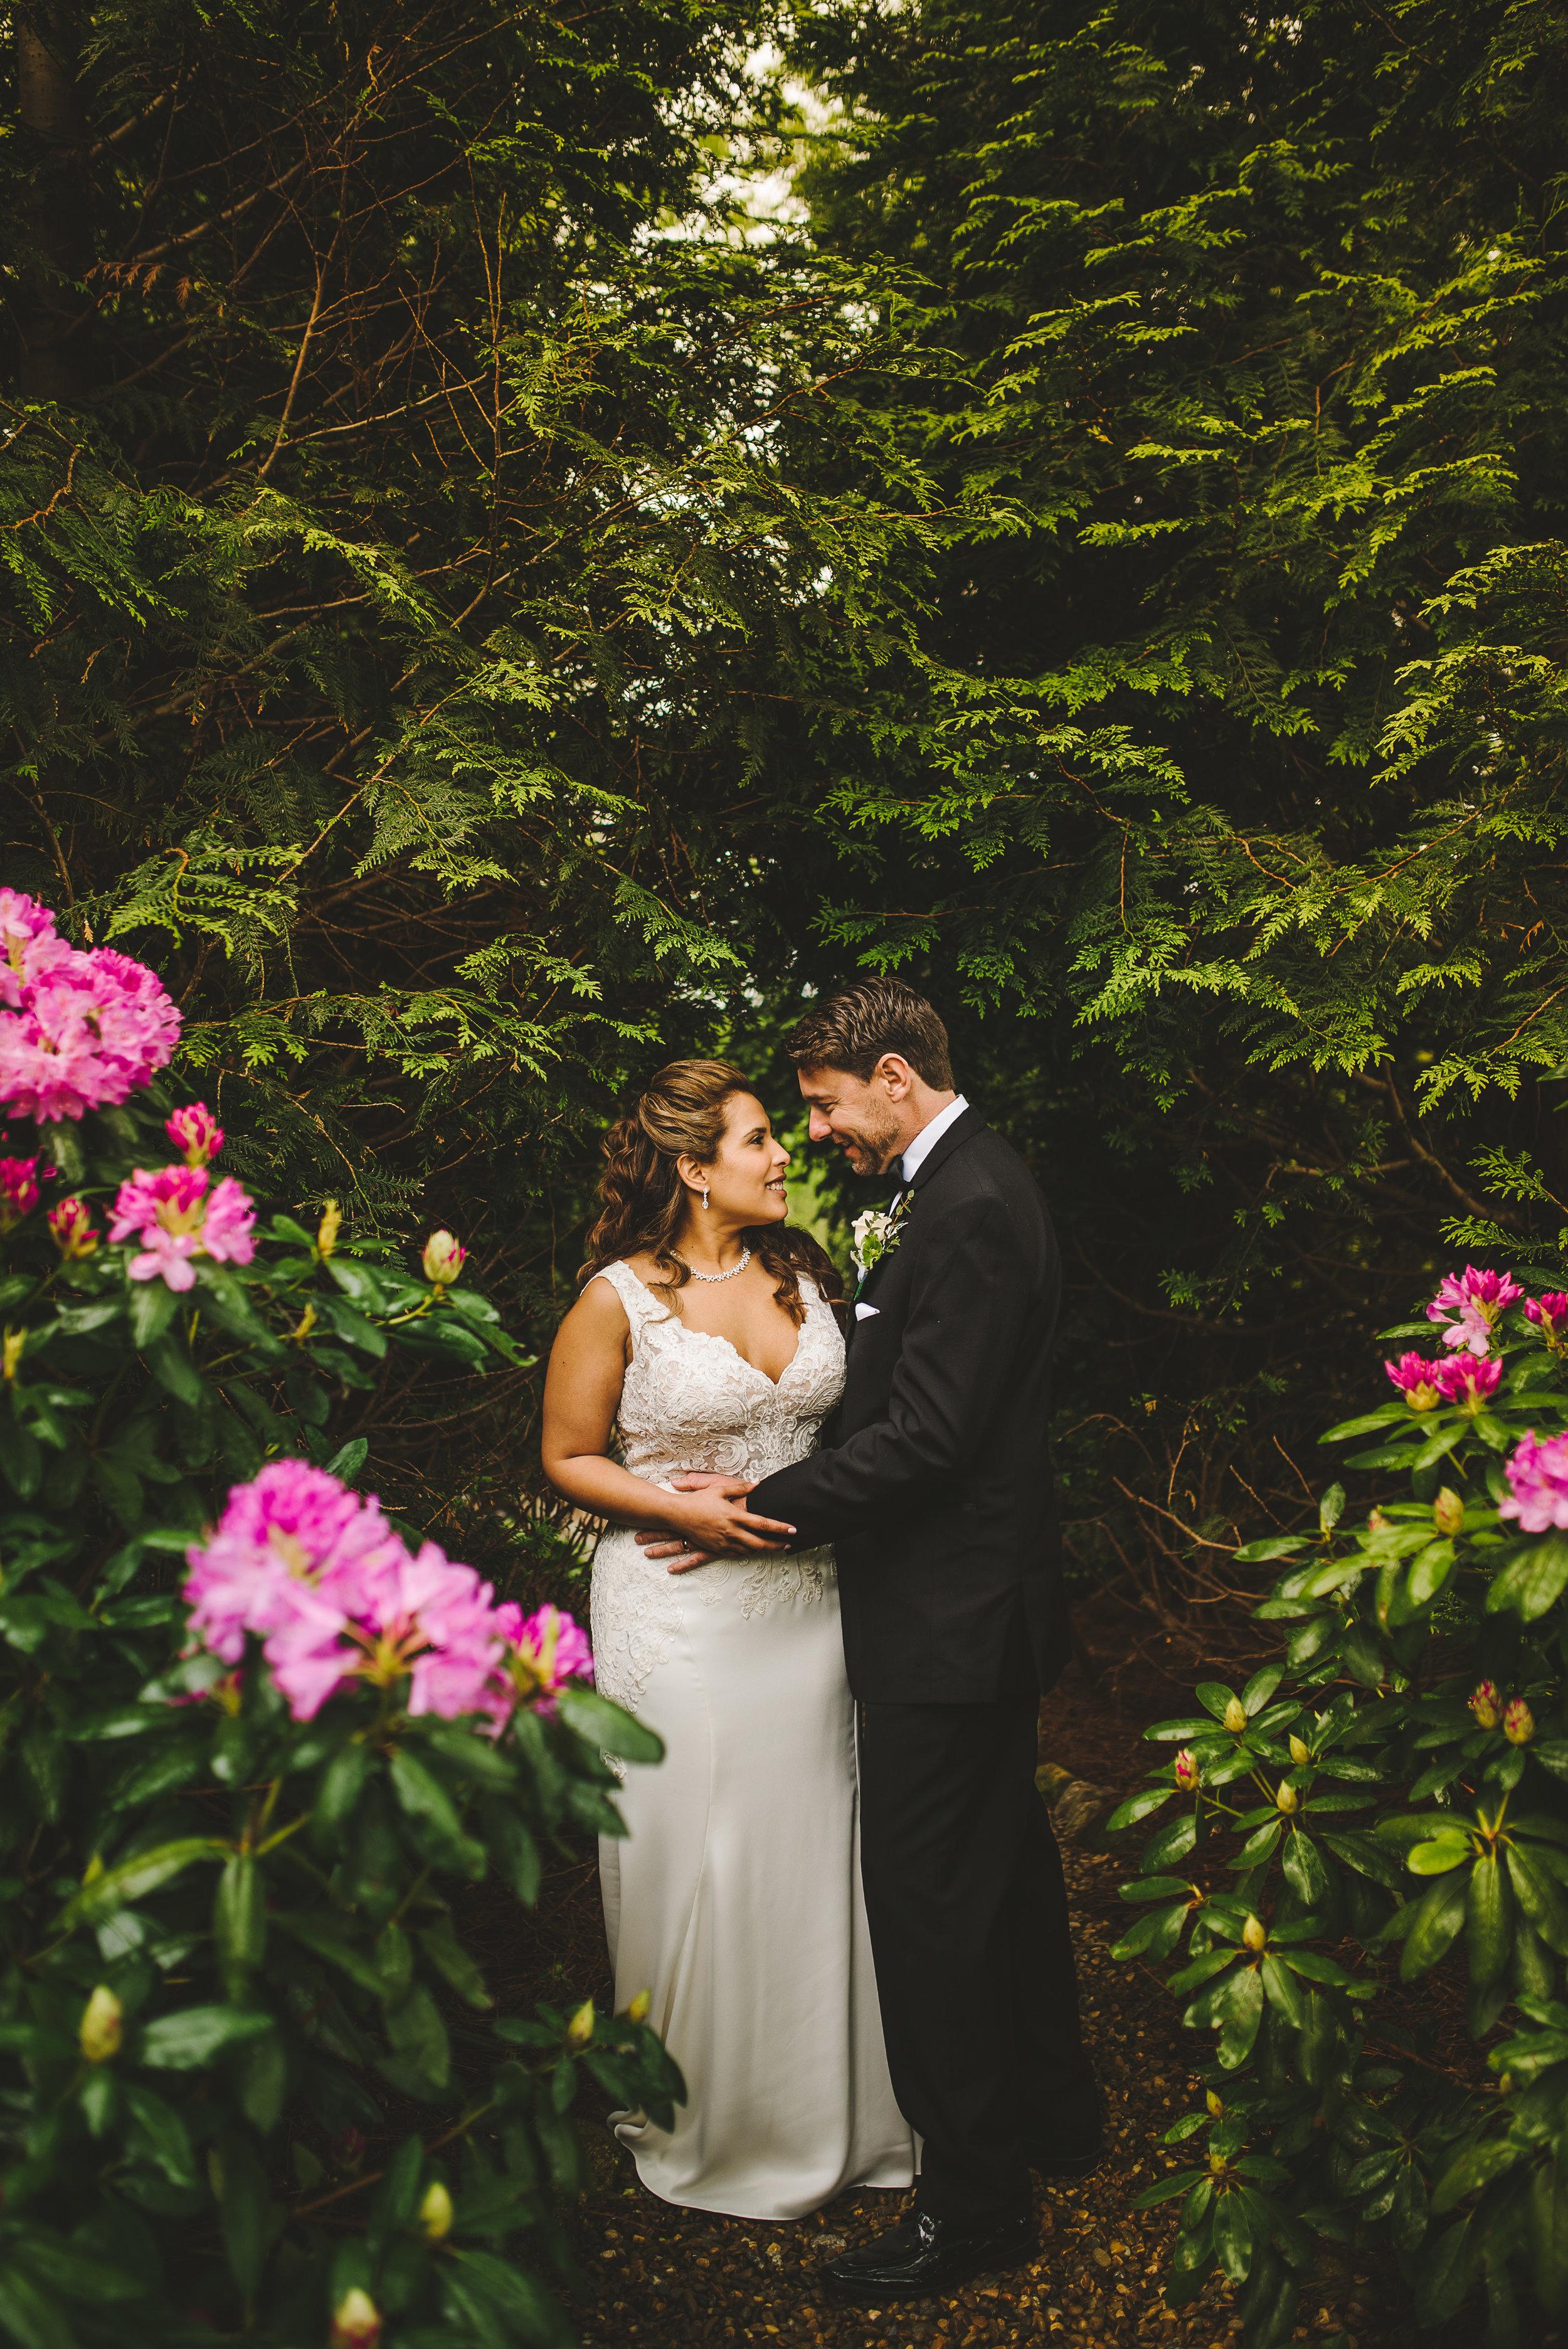 giovanna-richard-wedding-370.jpg